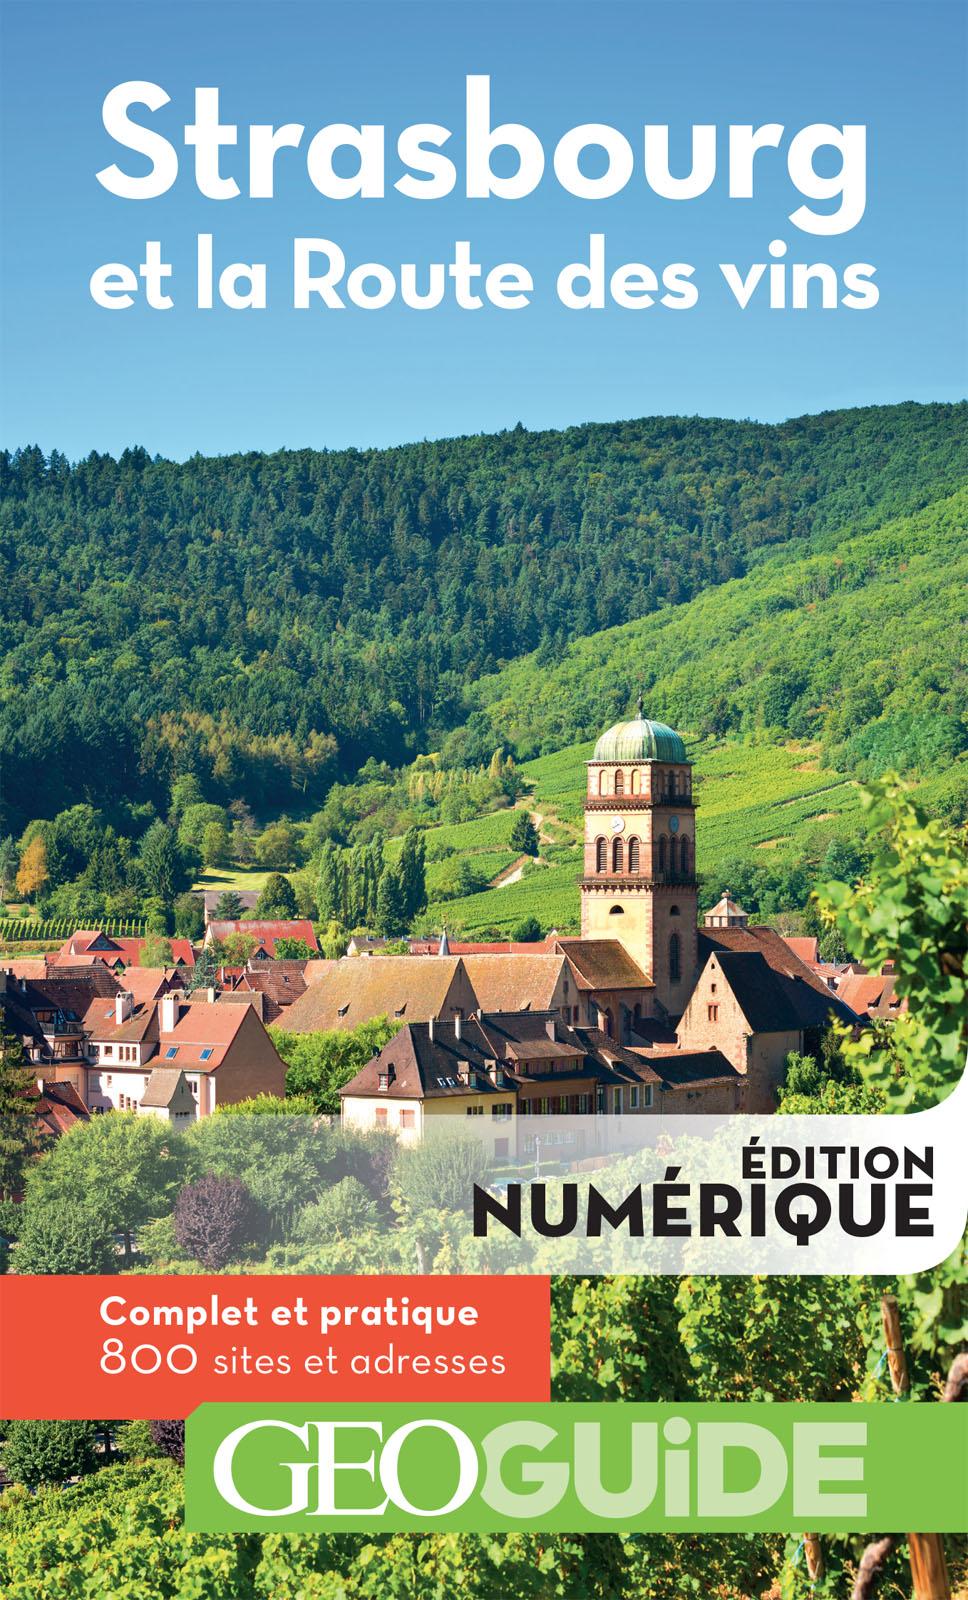 GEOguide Strasbourg et la route des vins | Collectif,